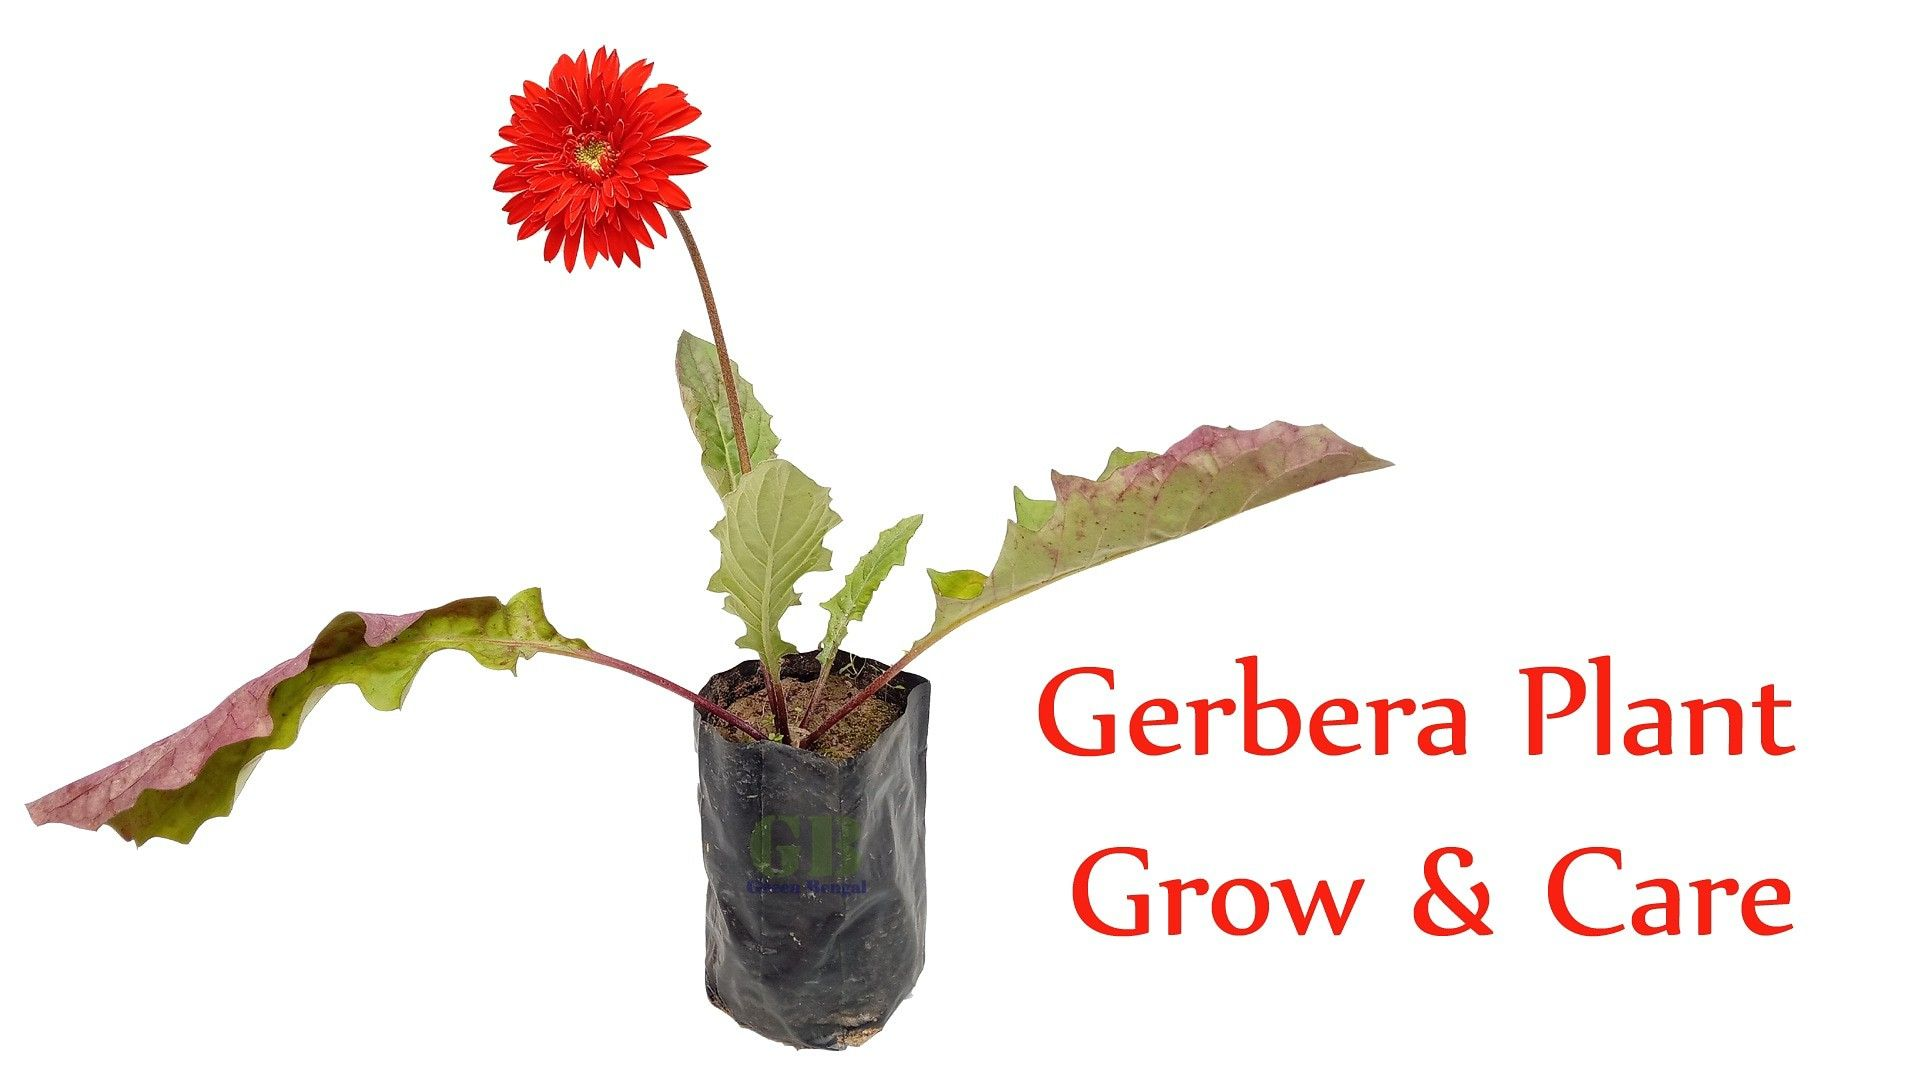 Gerbera Plant Grow And Care Tips Gerbera Gerberas Gerberadaisy Gerberadaisies Flowers Flowers Flower Daily Flower Specia Gerbera Plant Plants Low Maintenance Plants